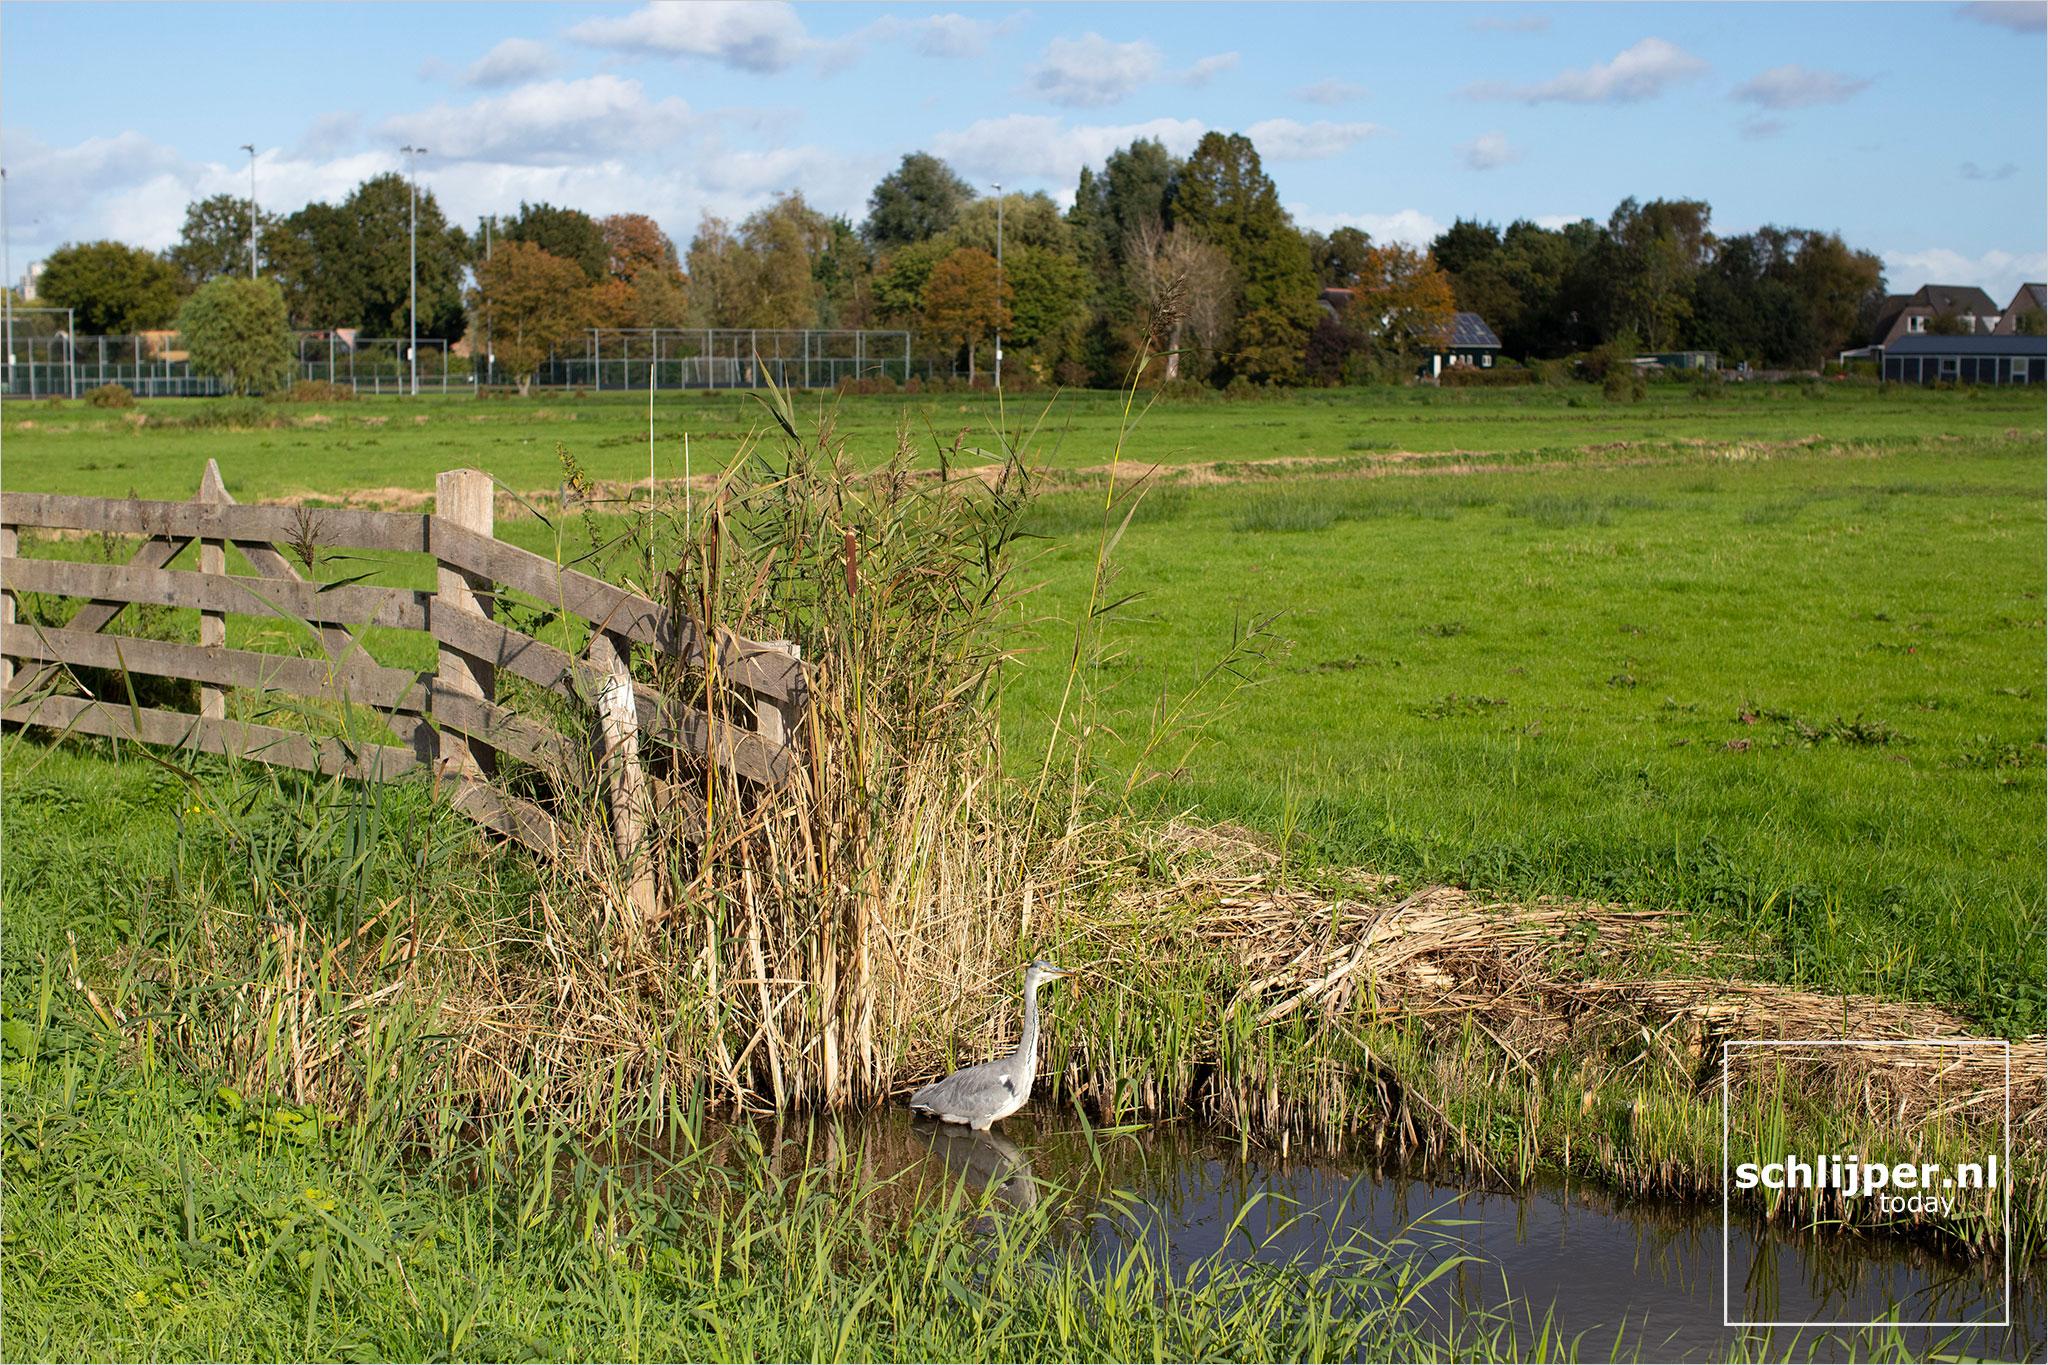 The Netherlands, Amstelveen, 12 oktober 2021